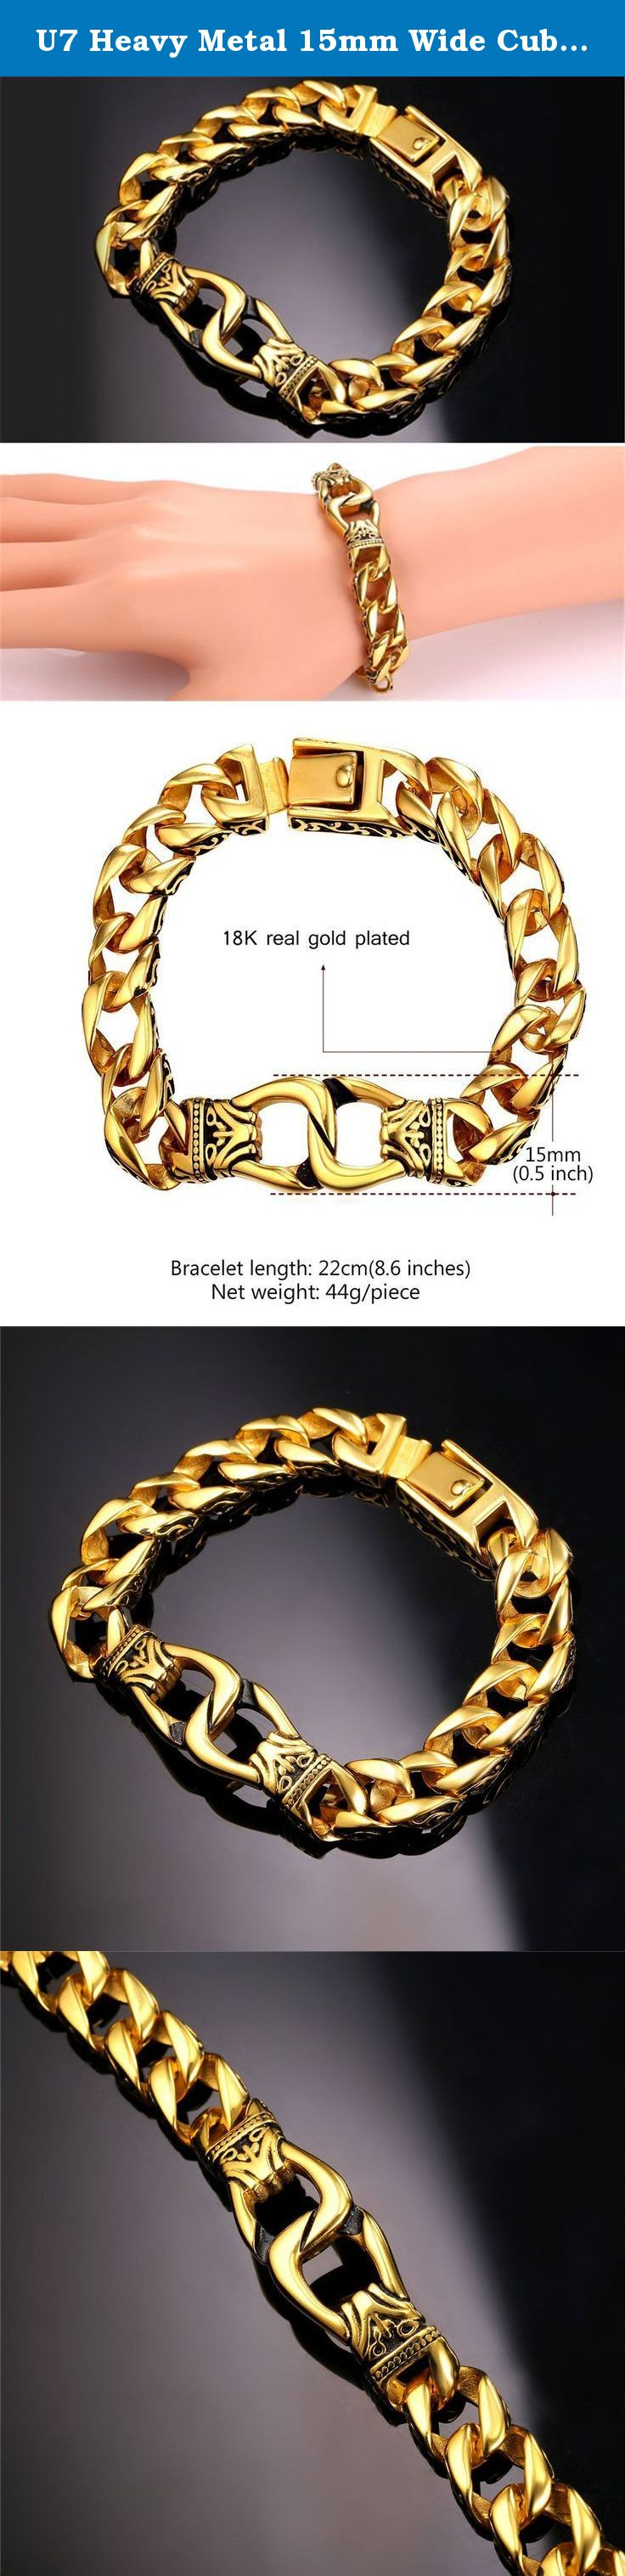 U heavy metal mm wide cuban chain bracelet menus k gold plated